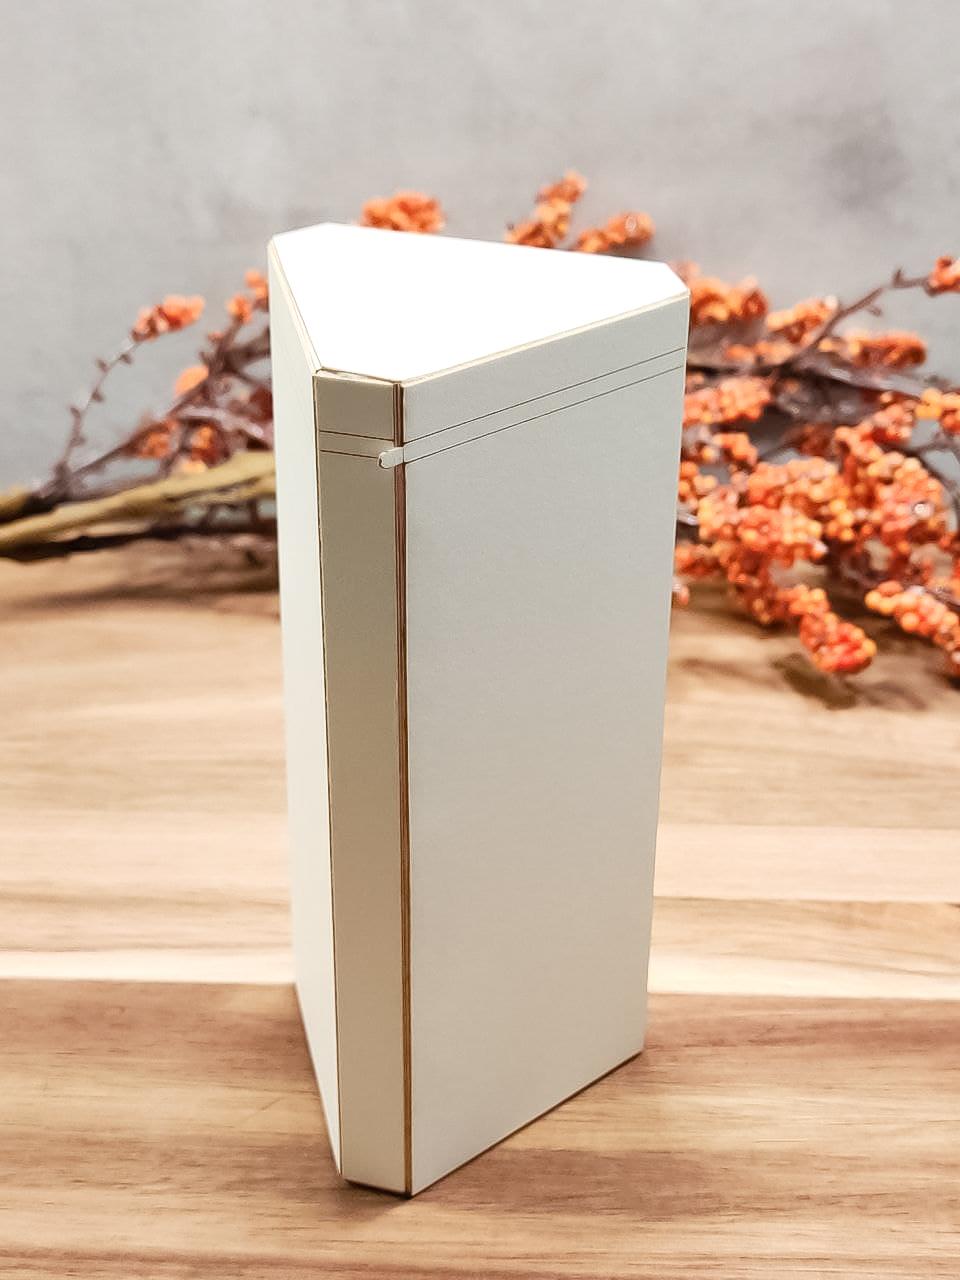 carton-award-image 246548